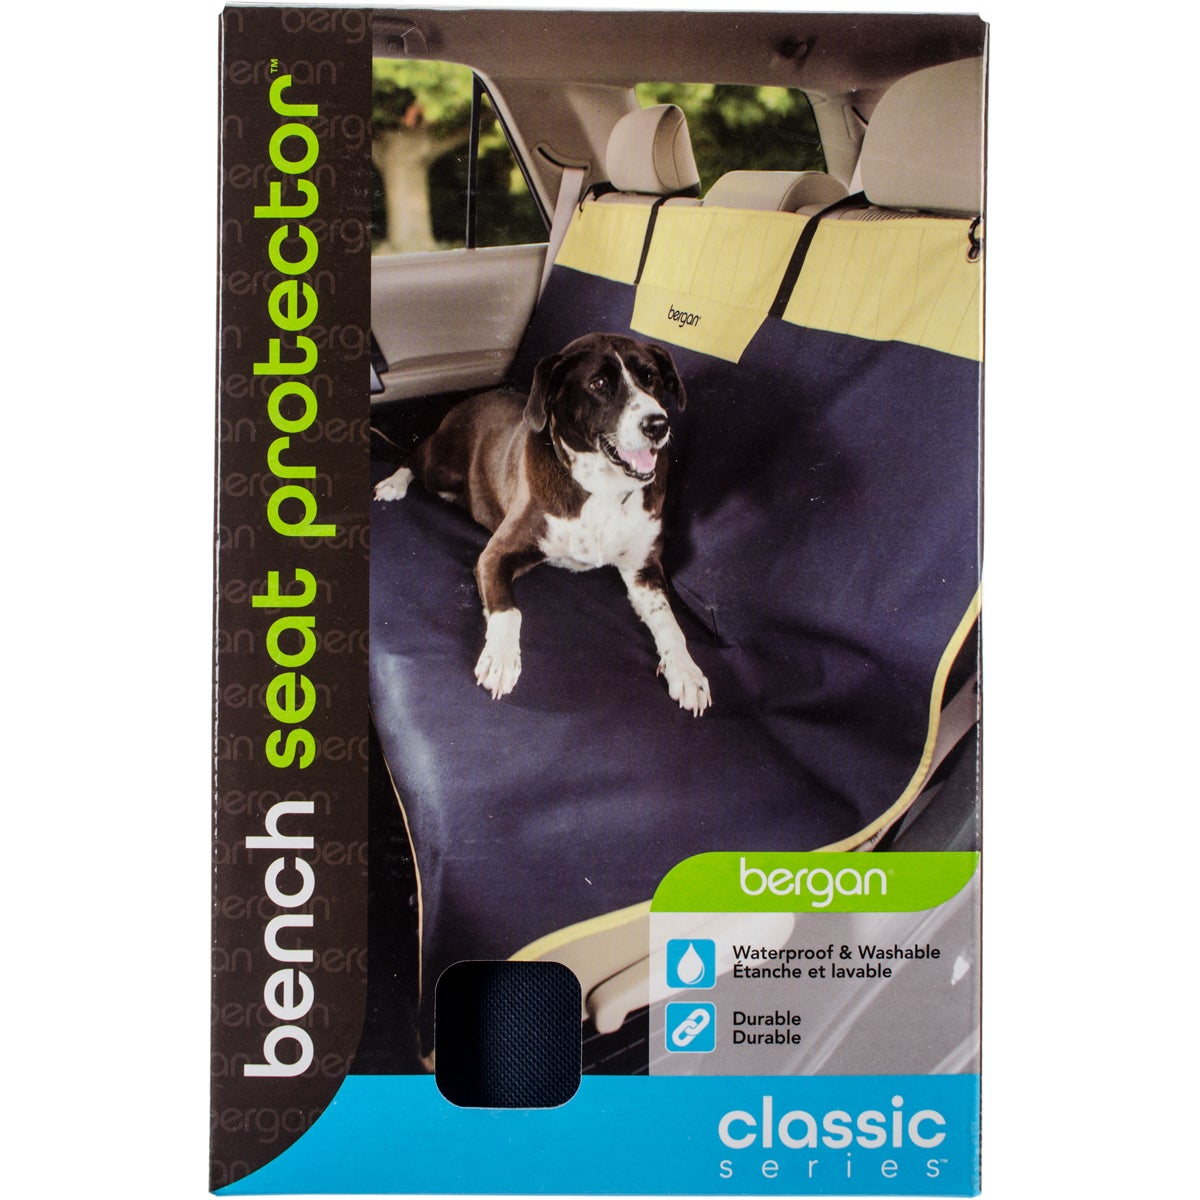 Coastal Bergan Classic 600D Polyester Auto Bench Seat Pro...